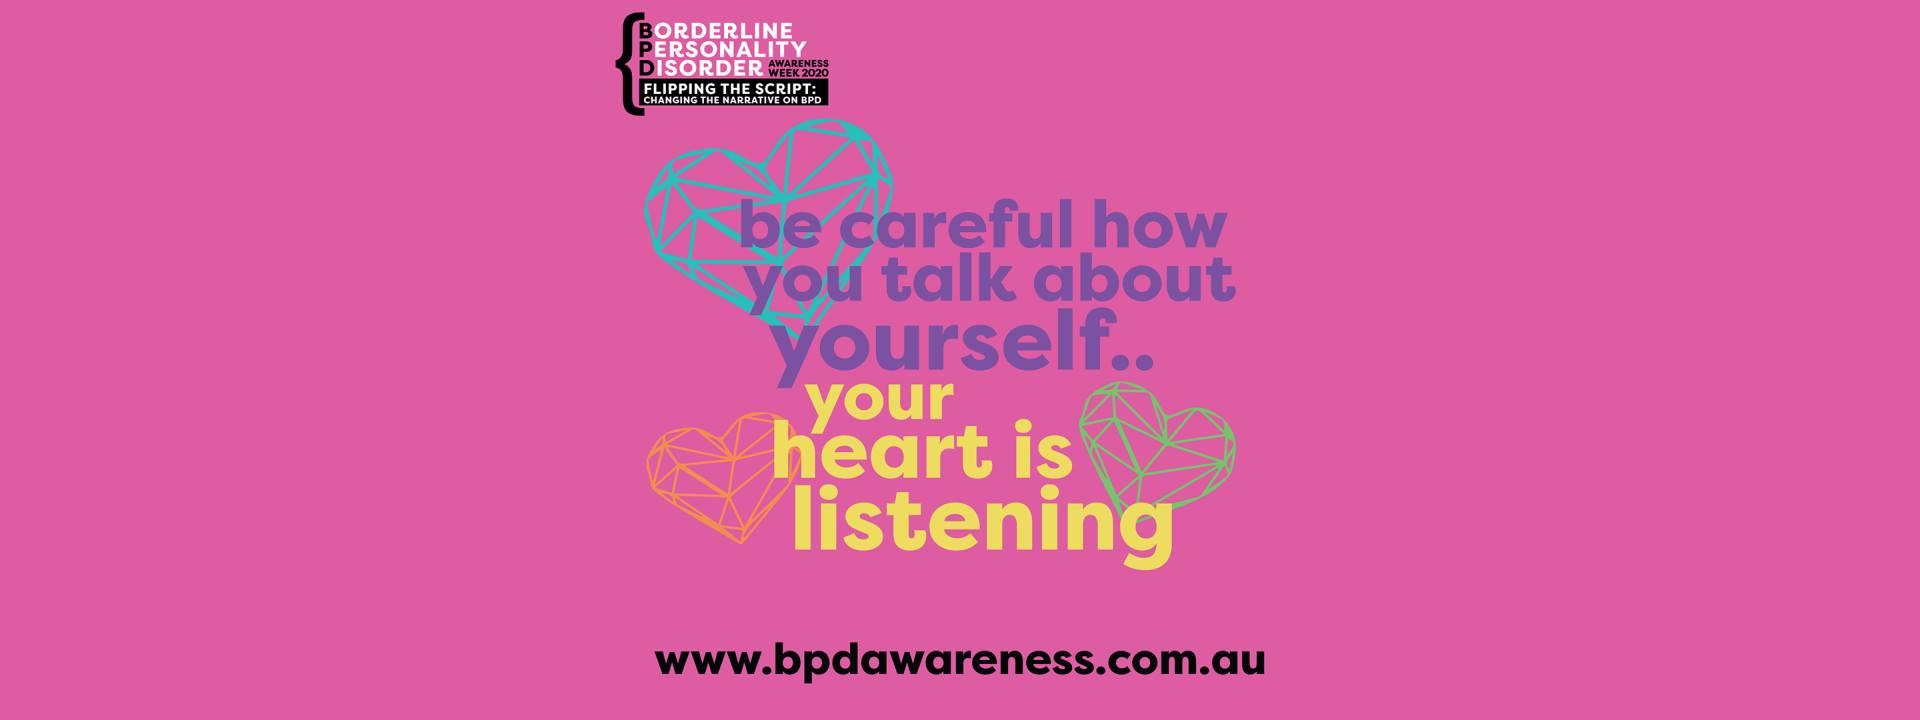 BPD Awareness Week 2020 - Your Heart is Listening